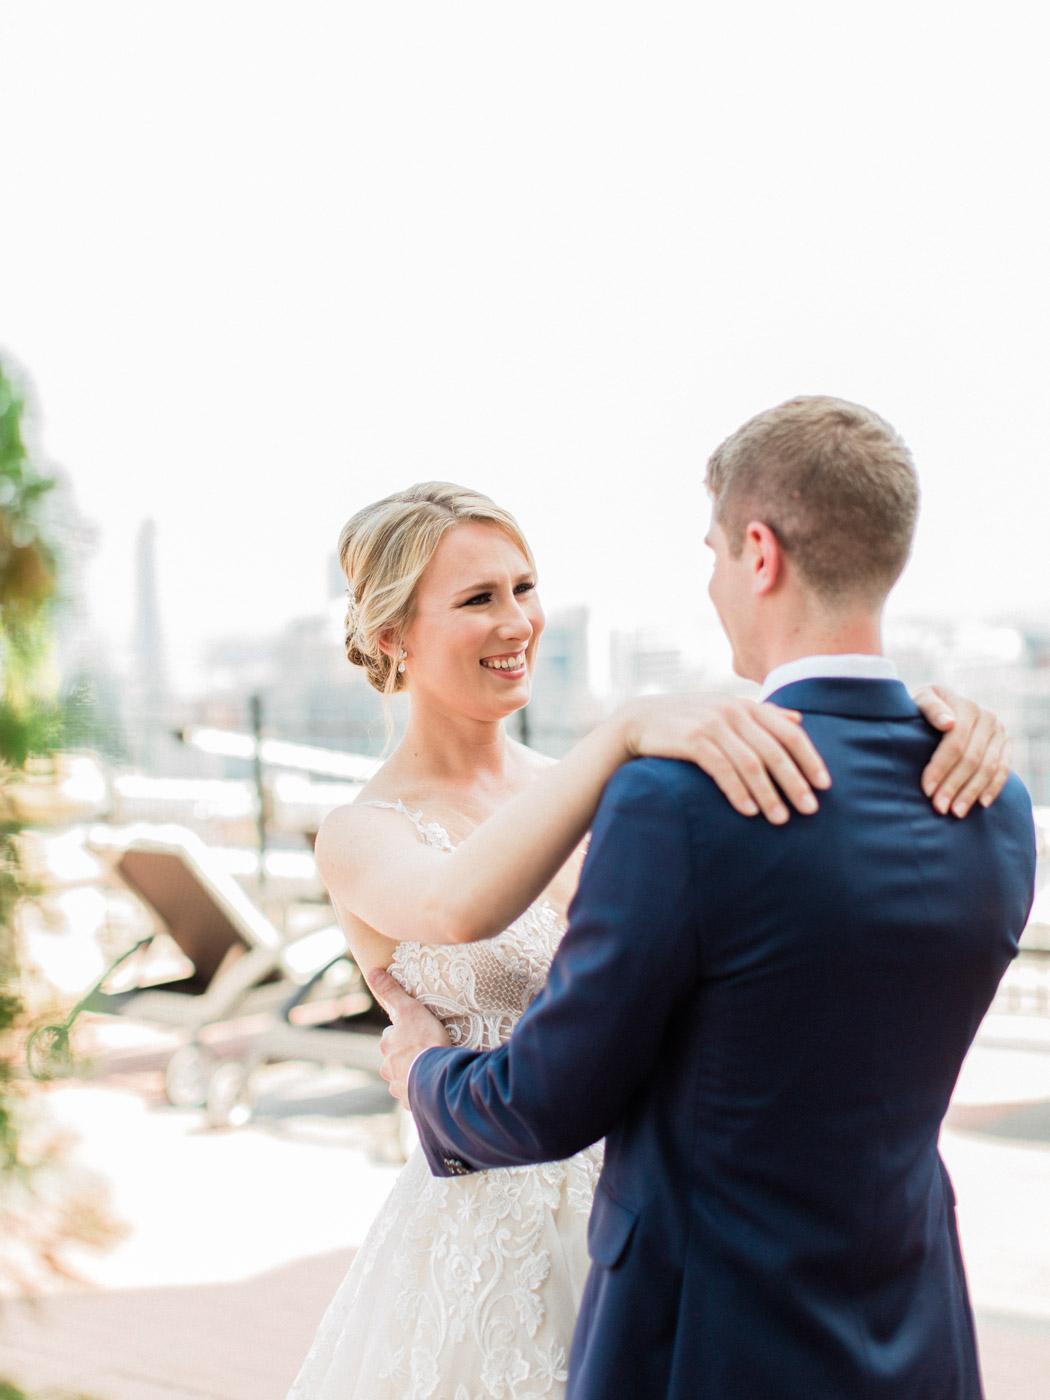 downtown-toronto-wedding-photographer-berkley-fieldhouse-blush-807.jpg